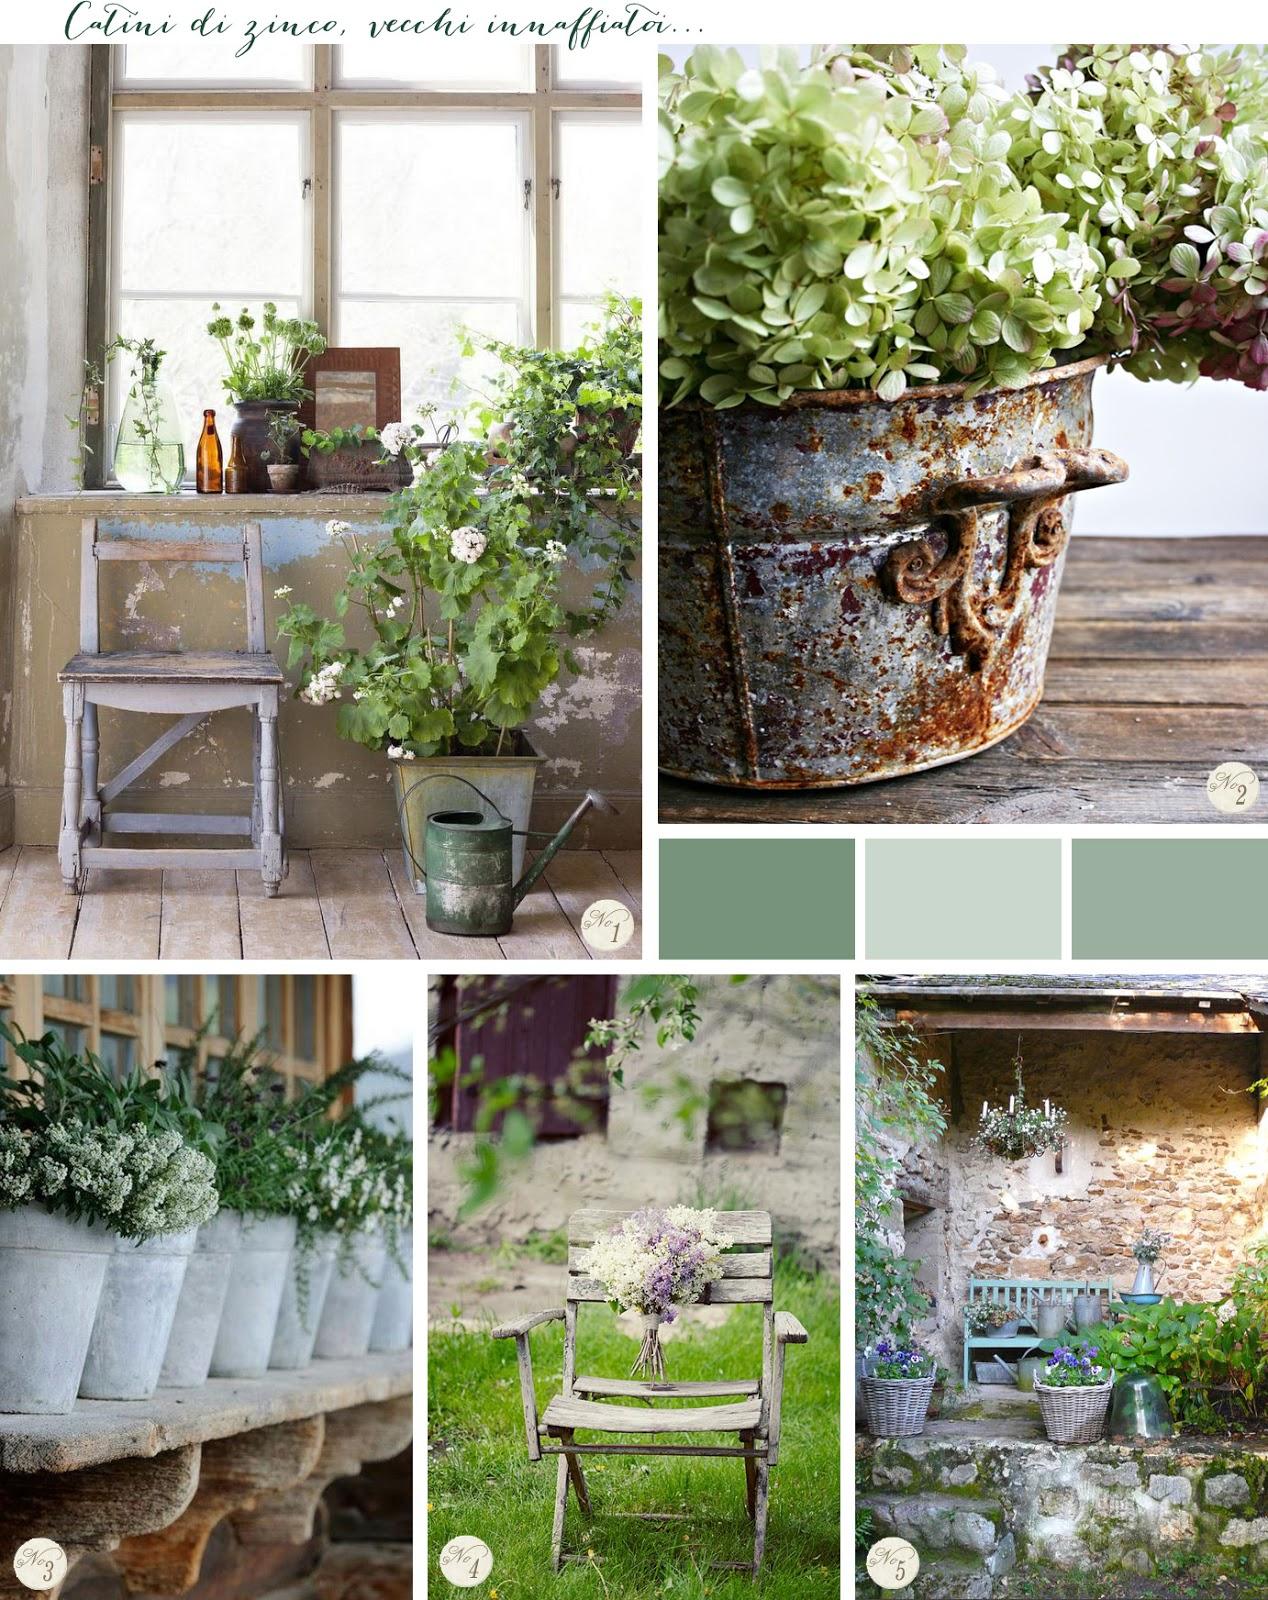 Ispirazioni per un giardino shabby chic - Shabby Chic Interiors